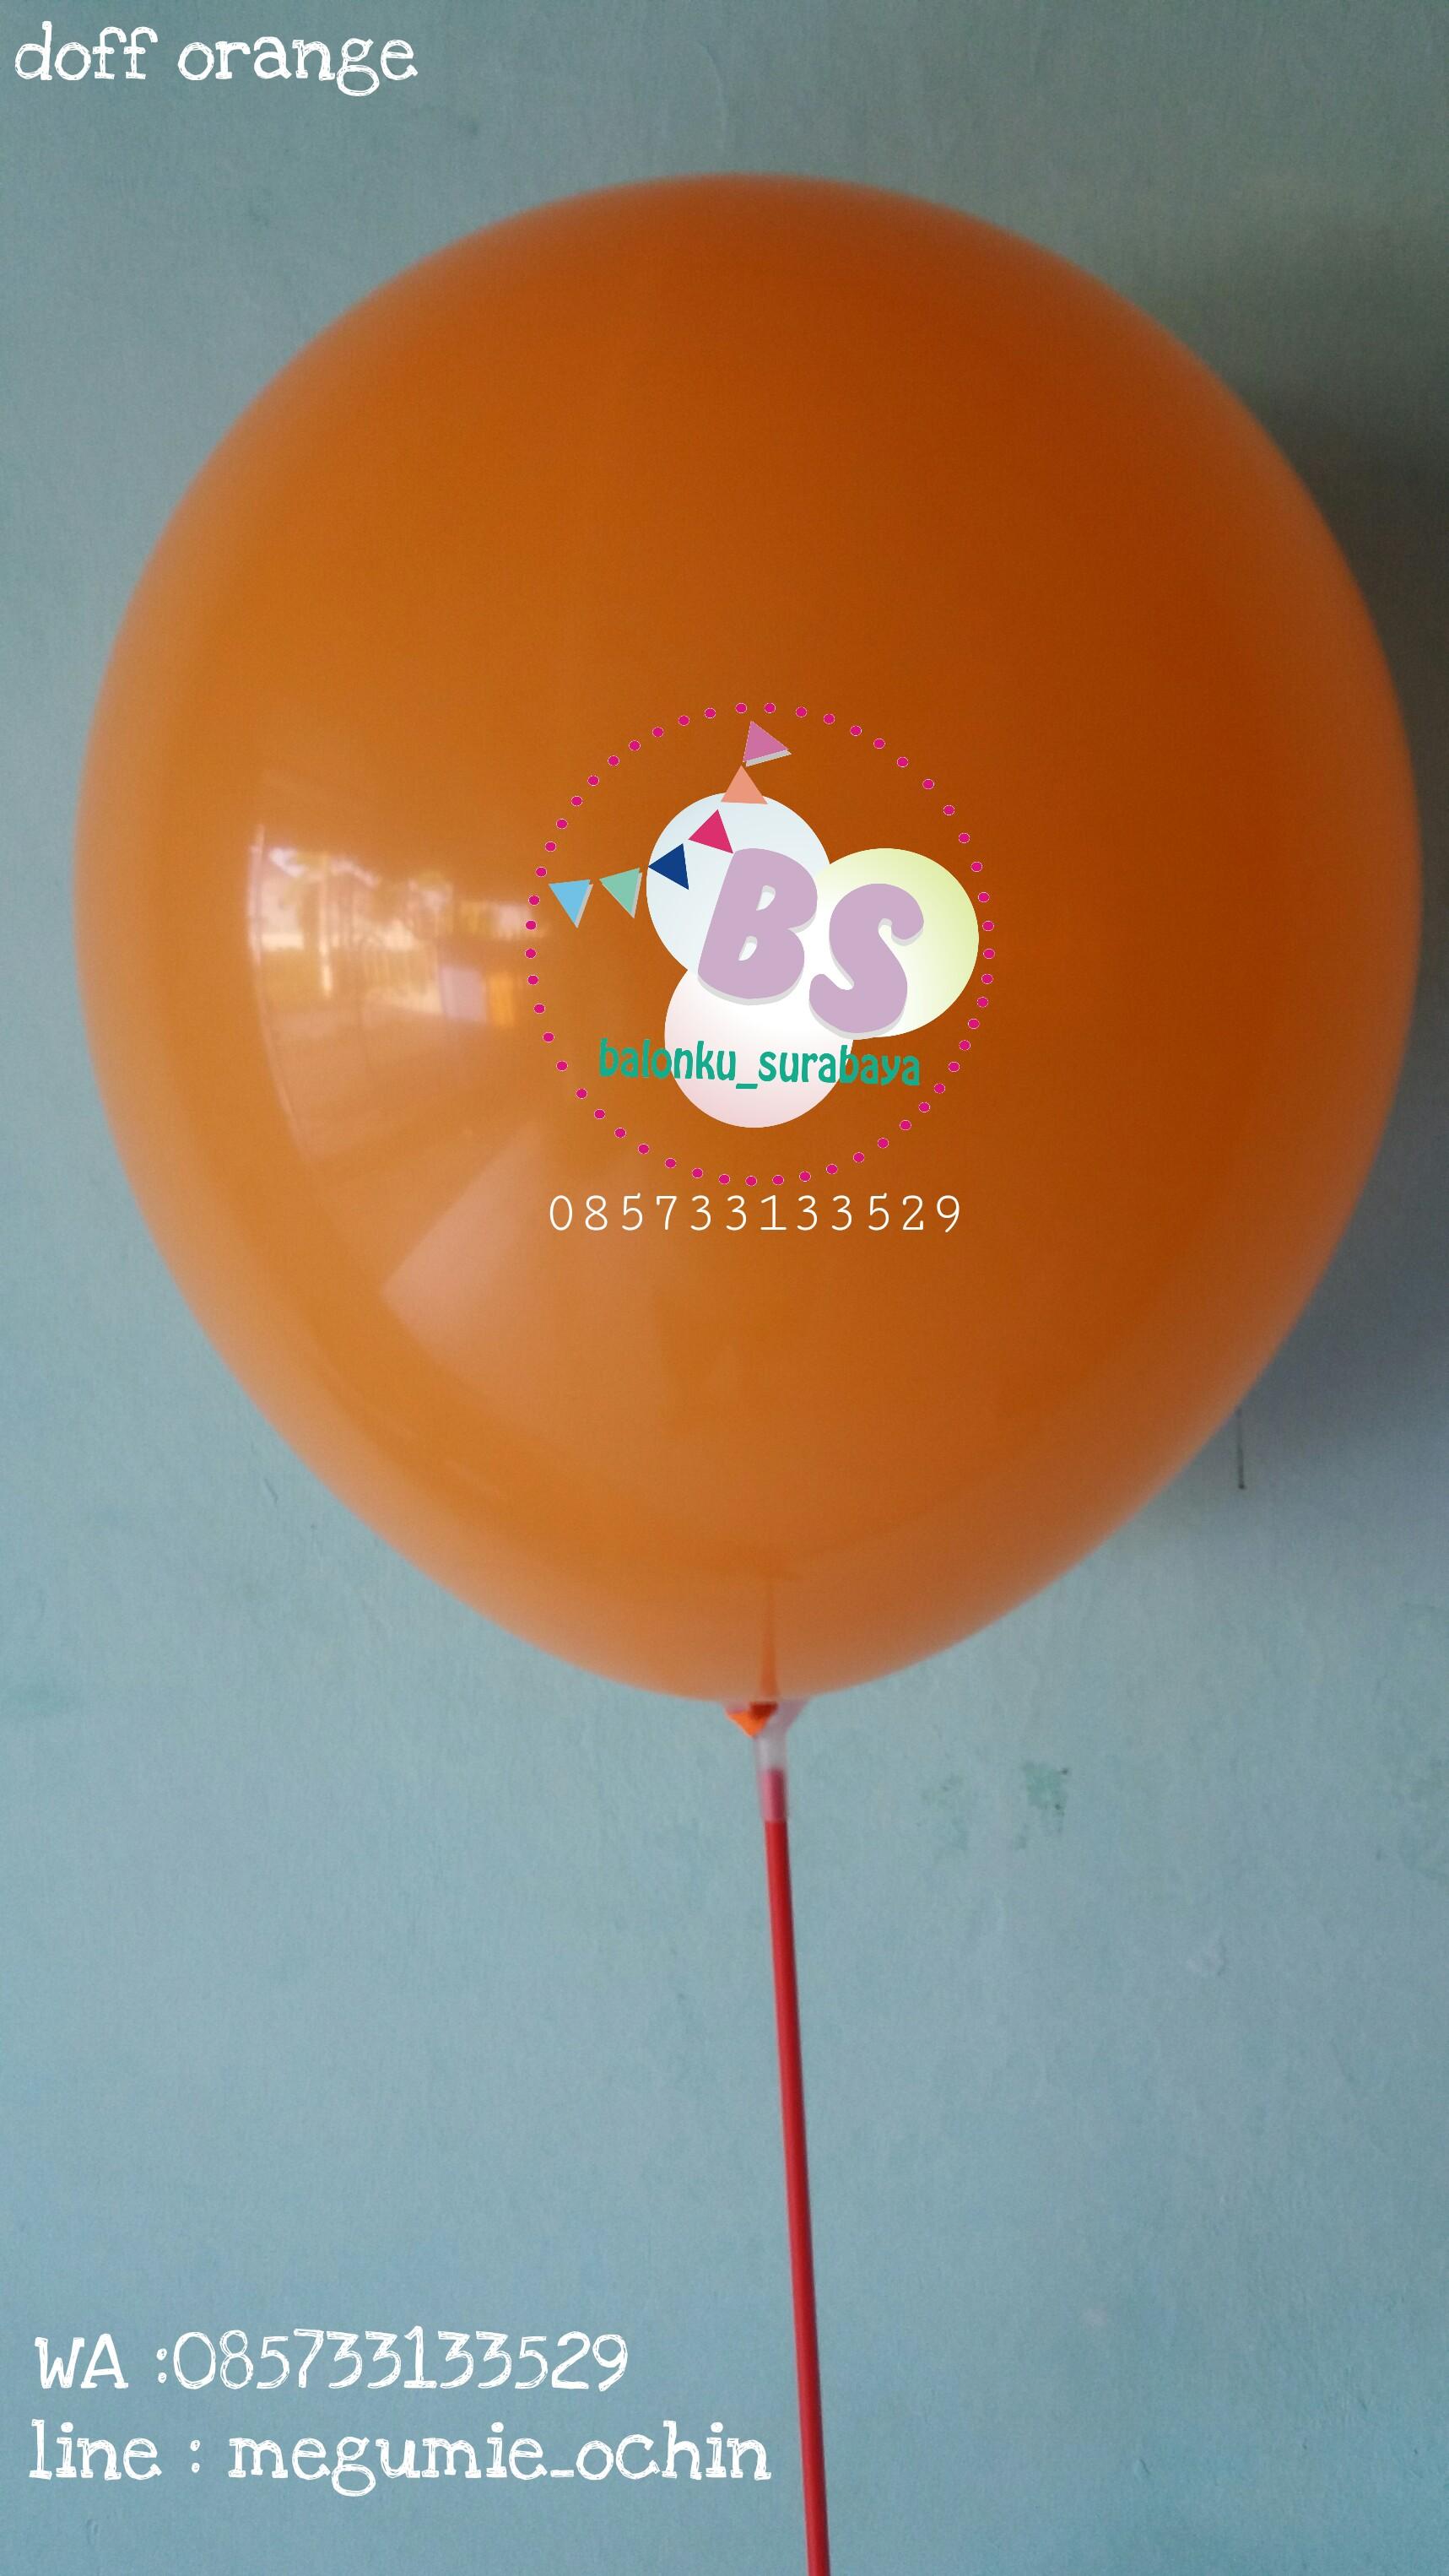 doff-orange